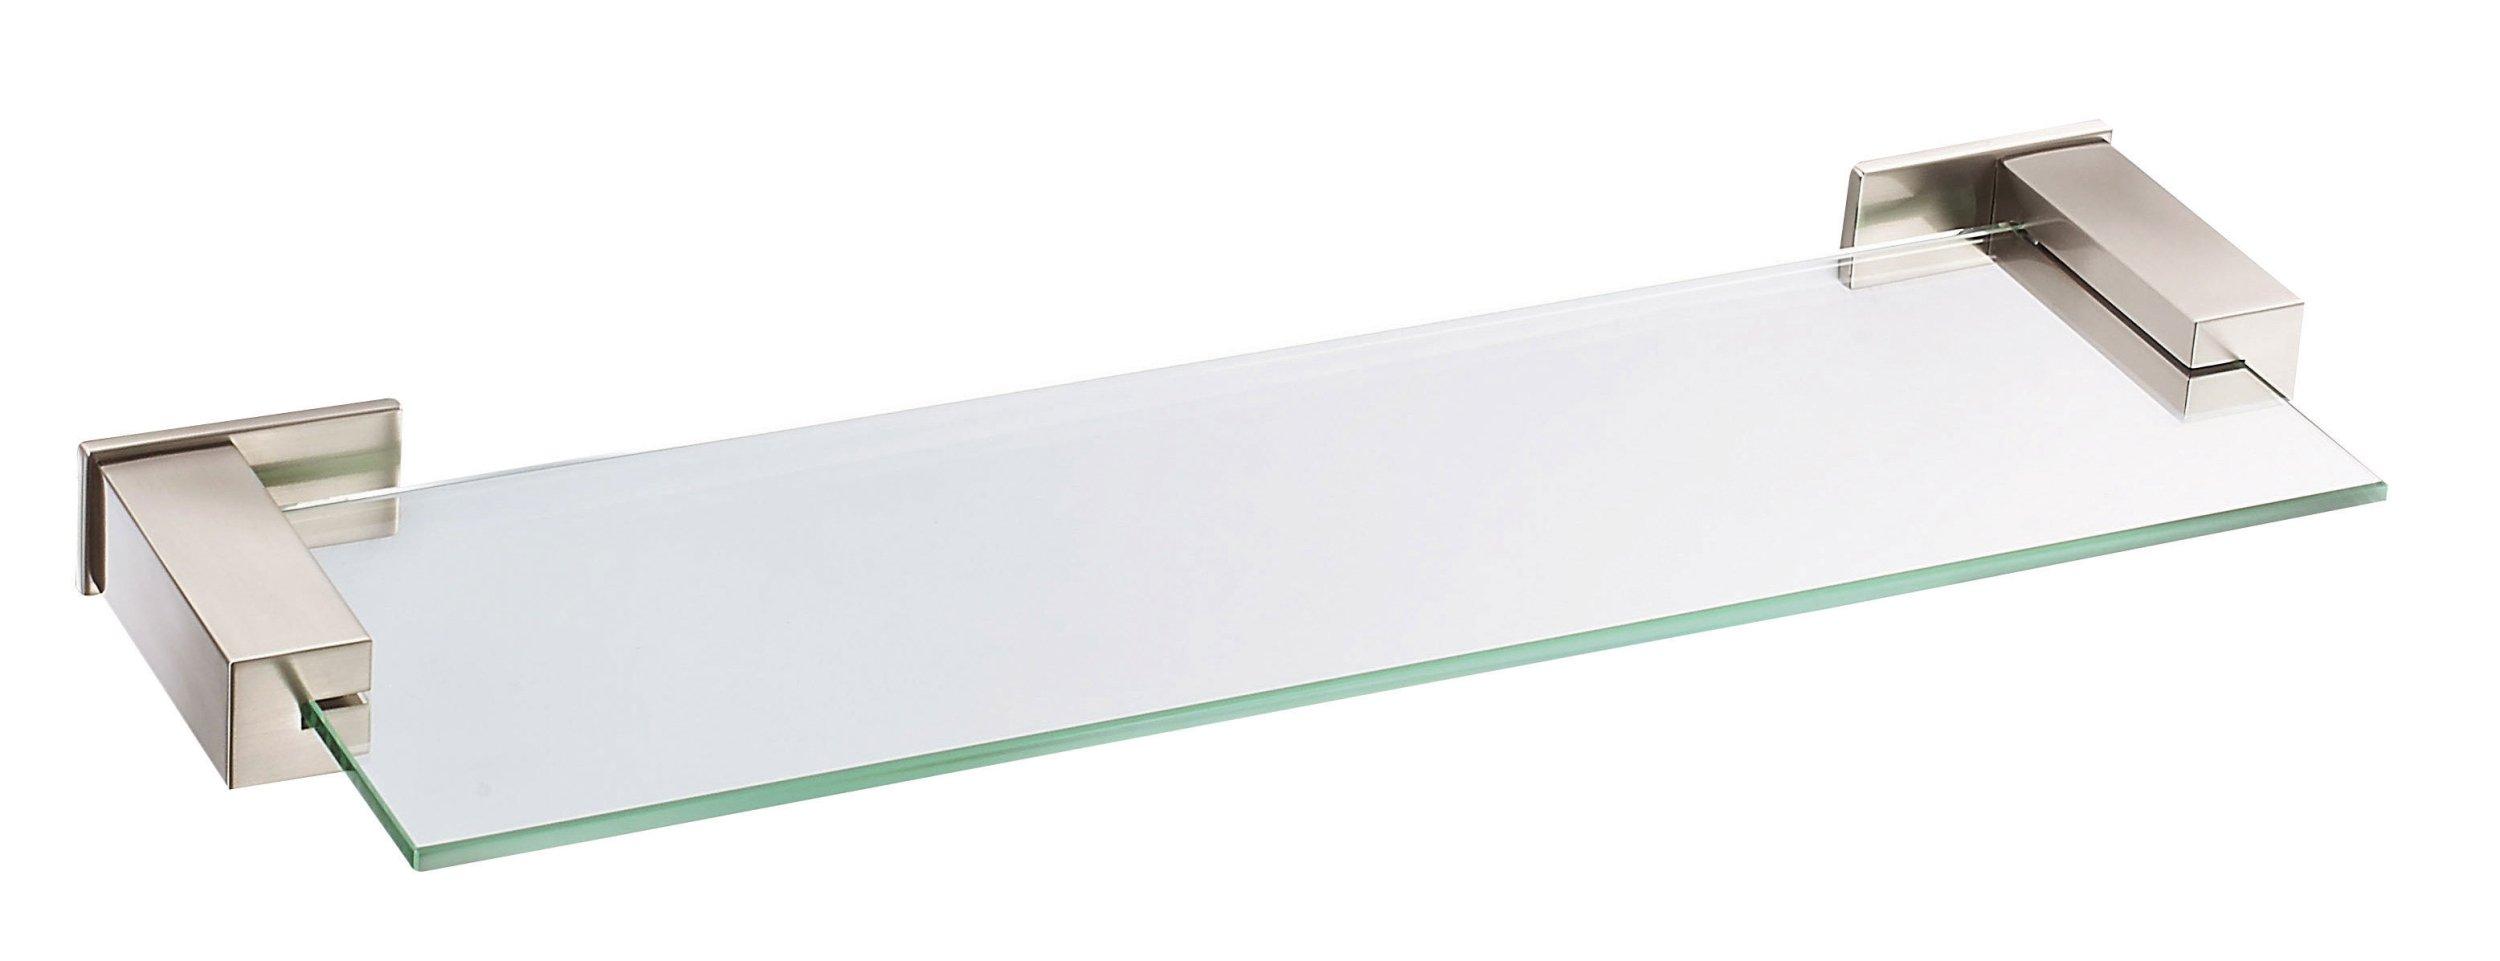 Danze D446134BN Sirius Glass Shelf, 18-Inch, Brushed Nickel